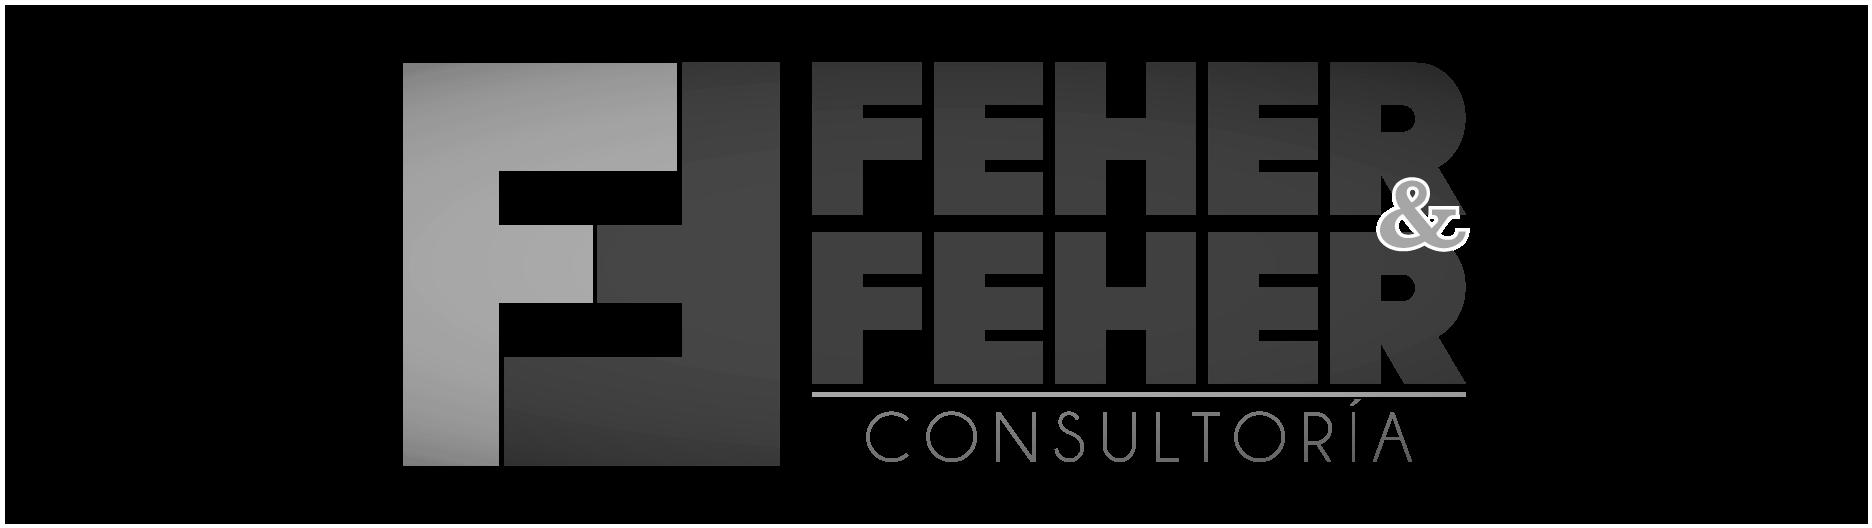 logo feher color_edited.png